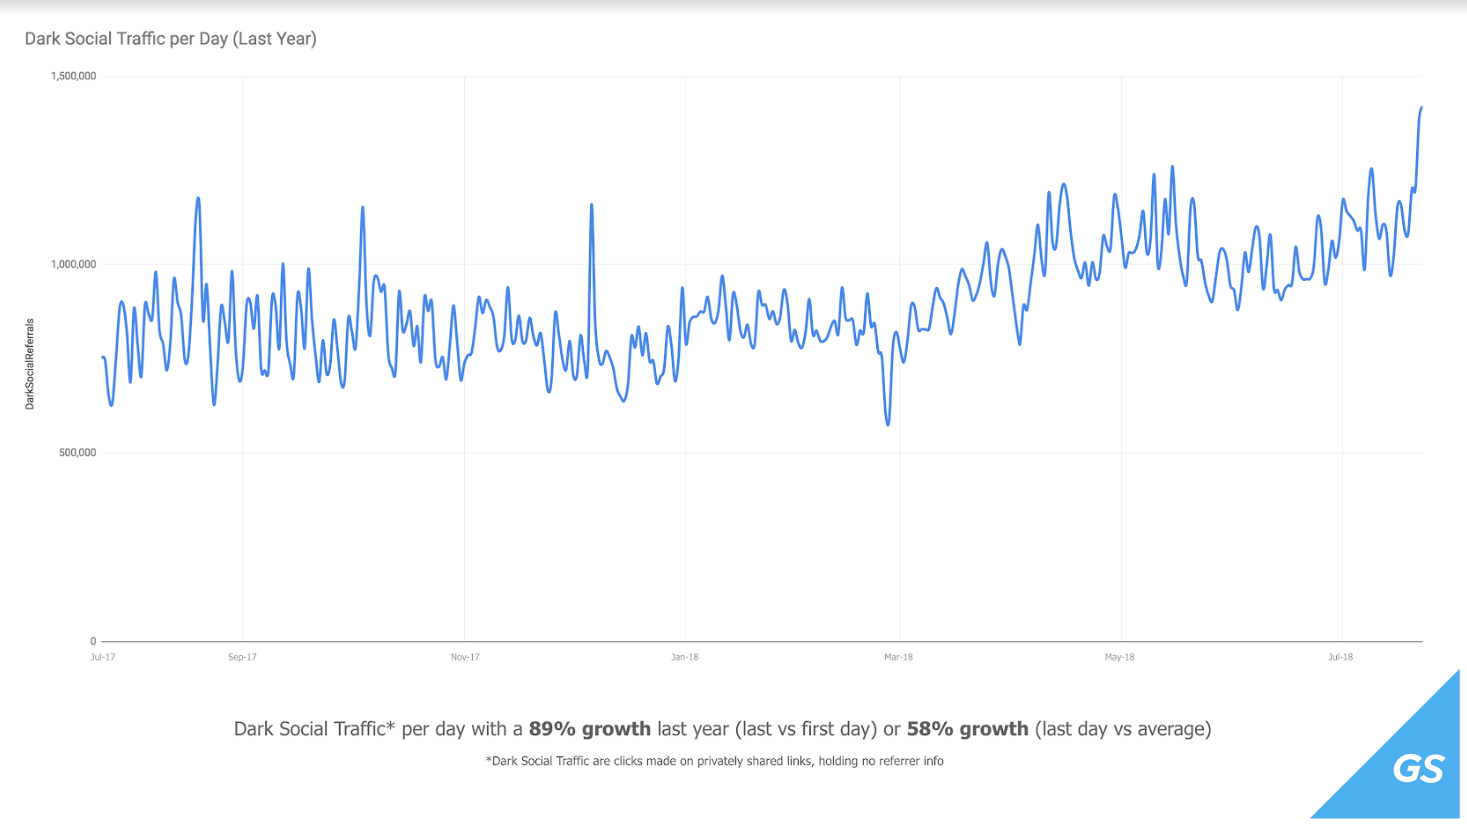 Dark social traffic per day